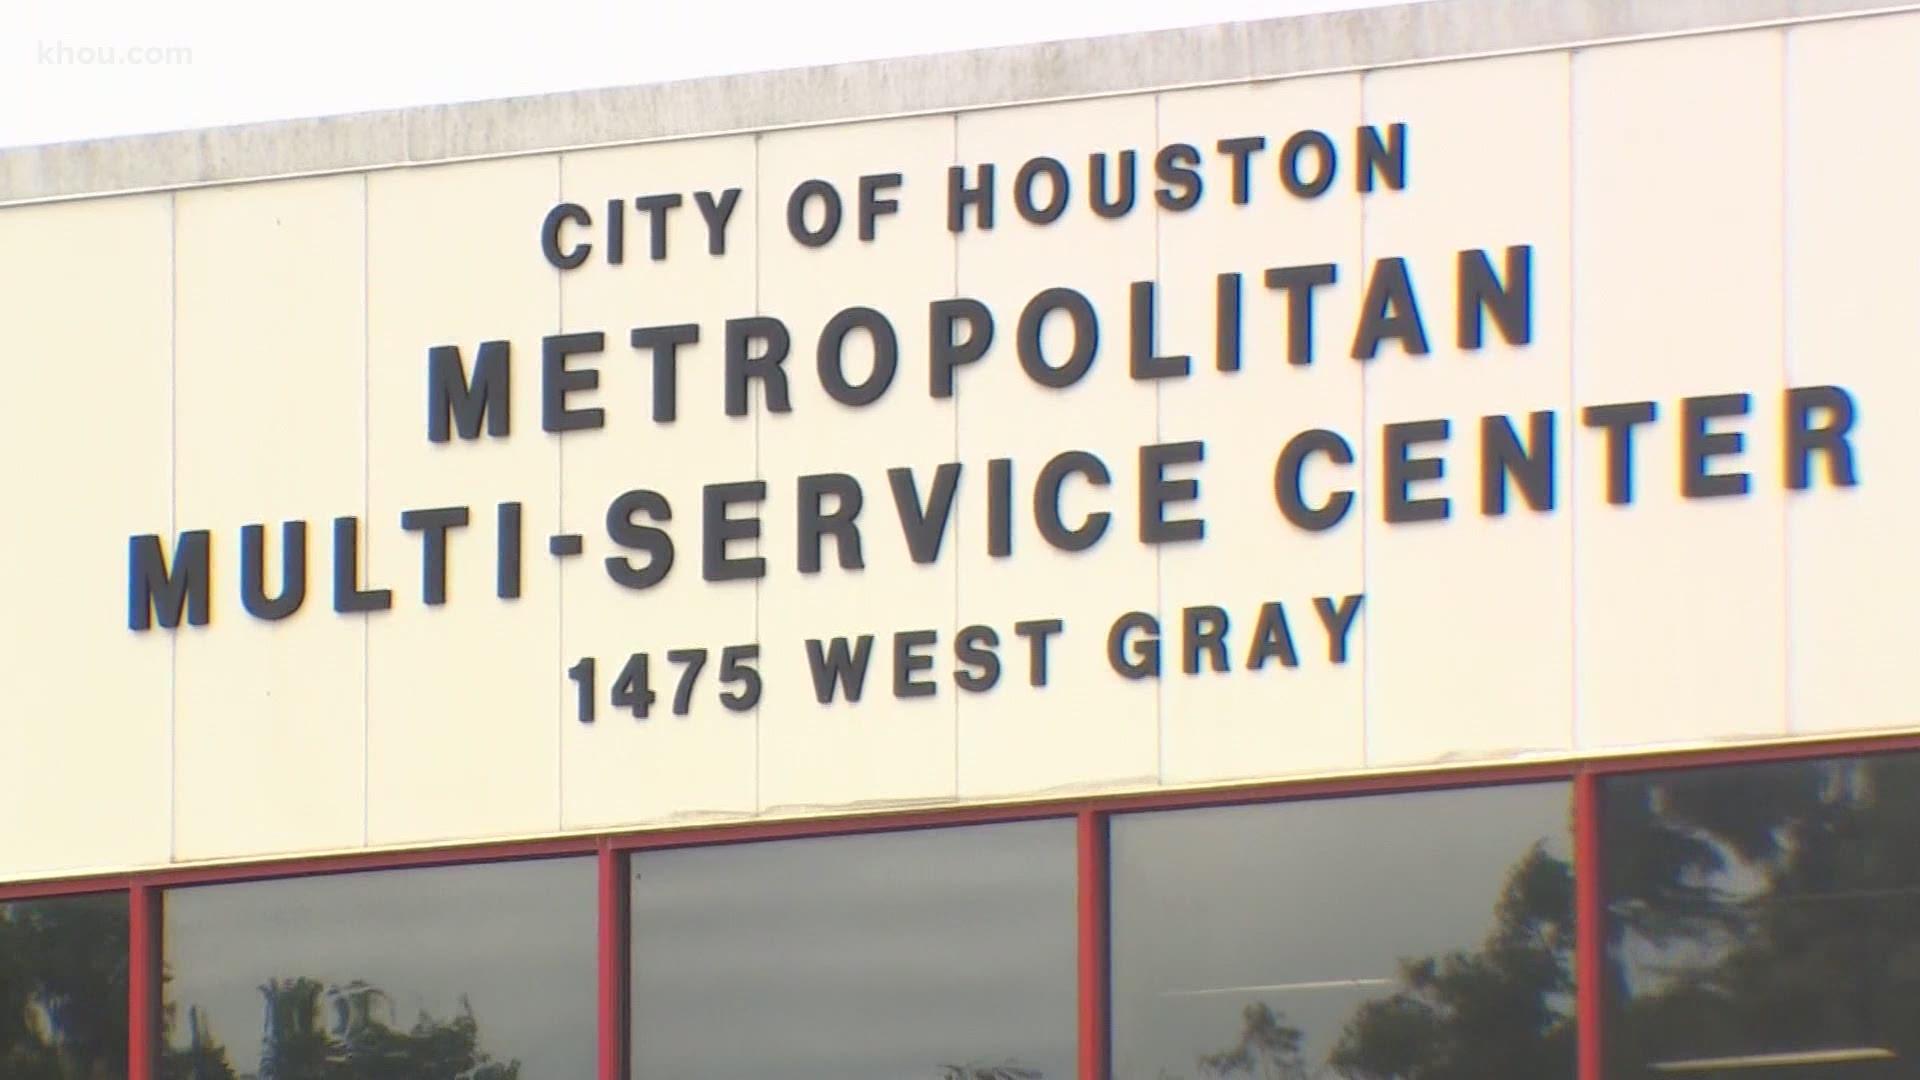 No National Guard At Houston Polling Centers Military Leader Say Khou Com